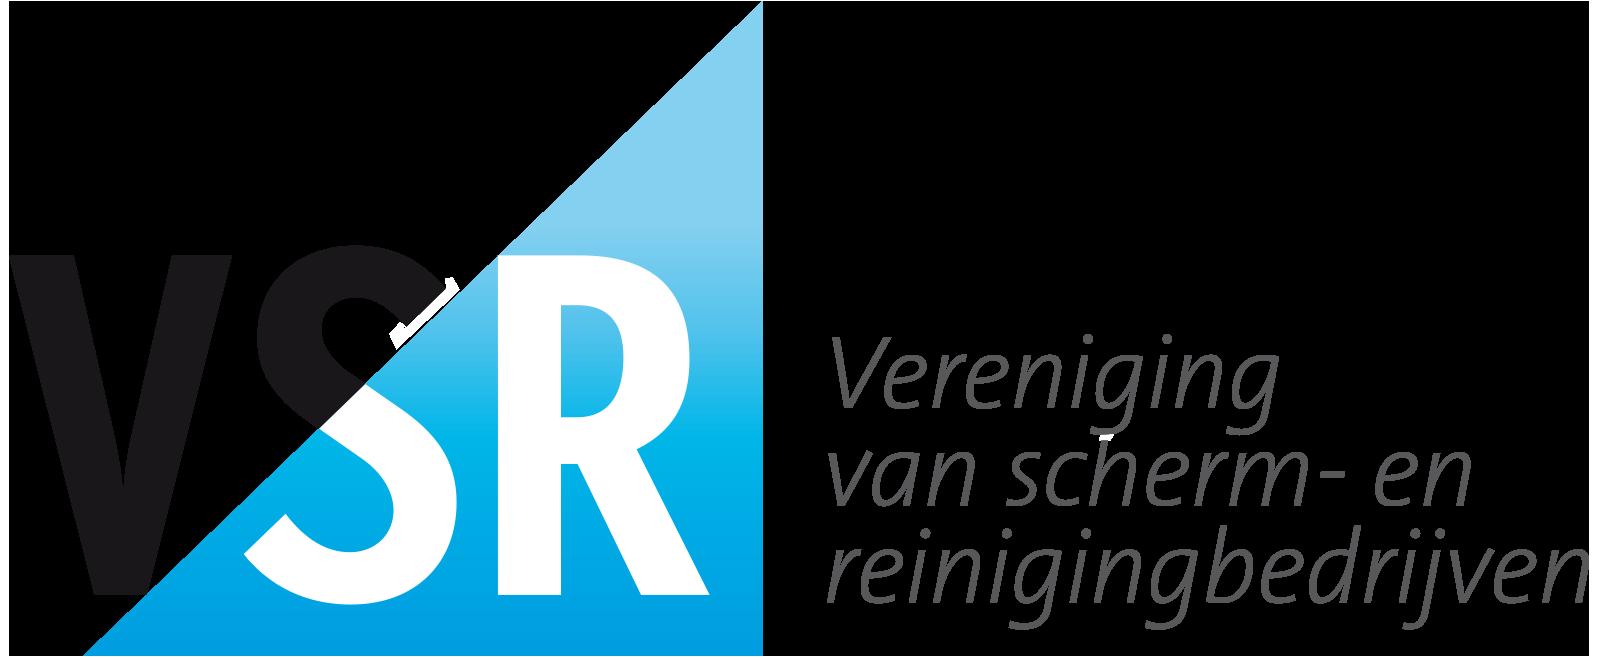 Vsrnl logo by RDR Reclame & Illustraties